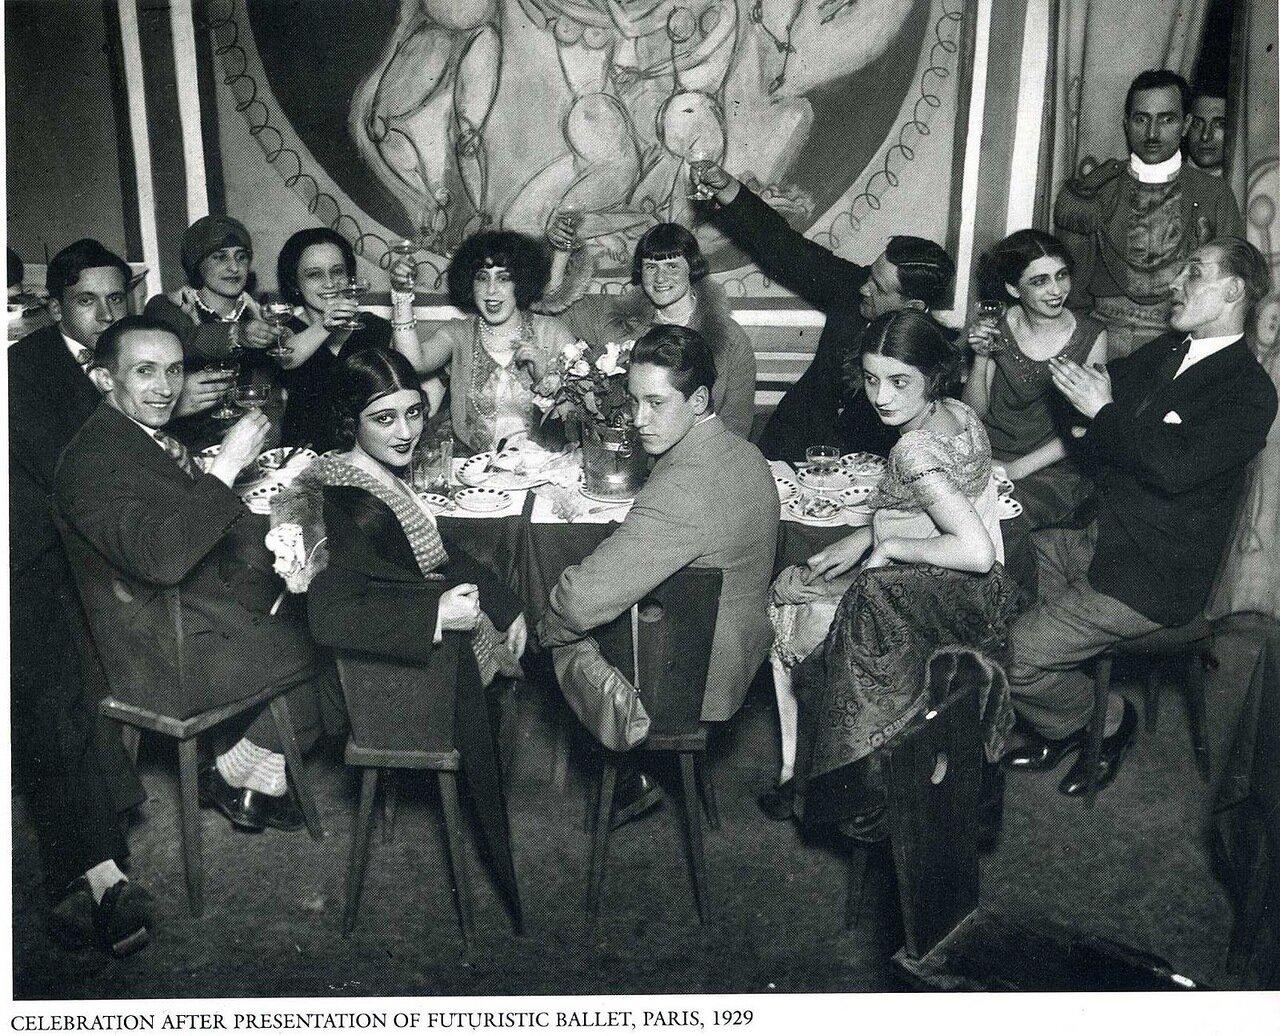 1929. Париж. Вечеринка после презентации футуристического балета